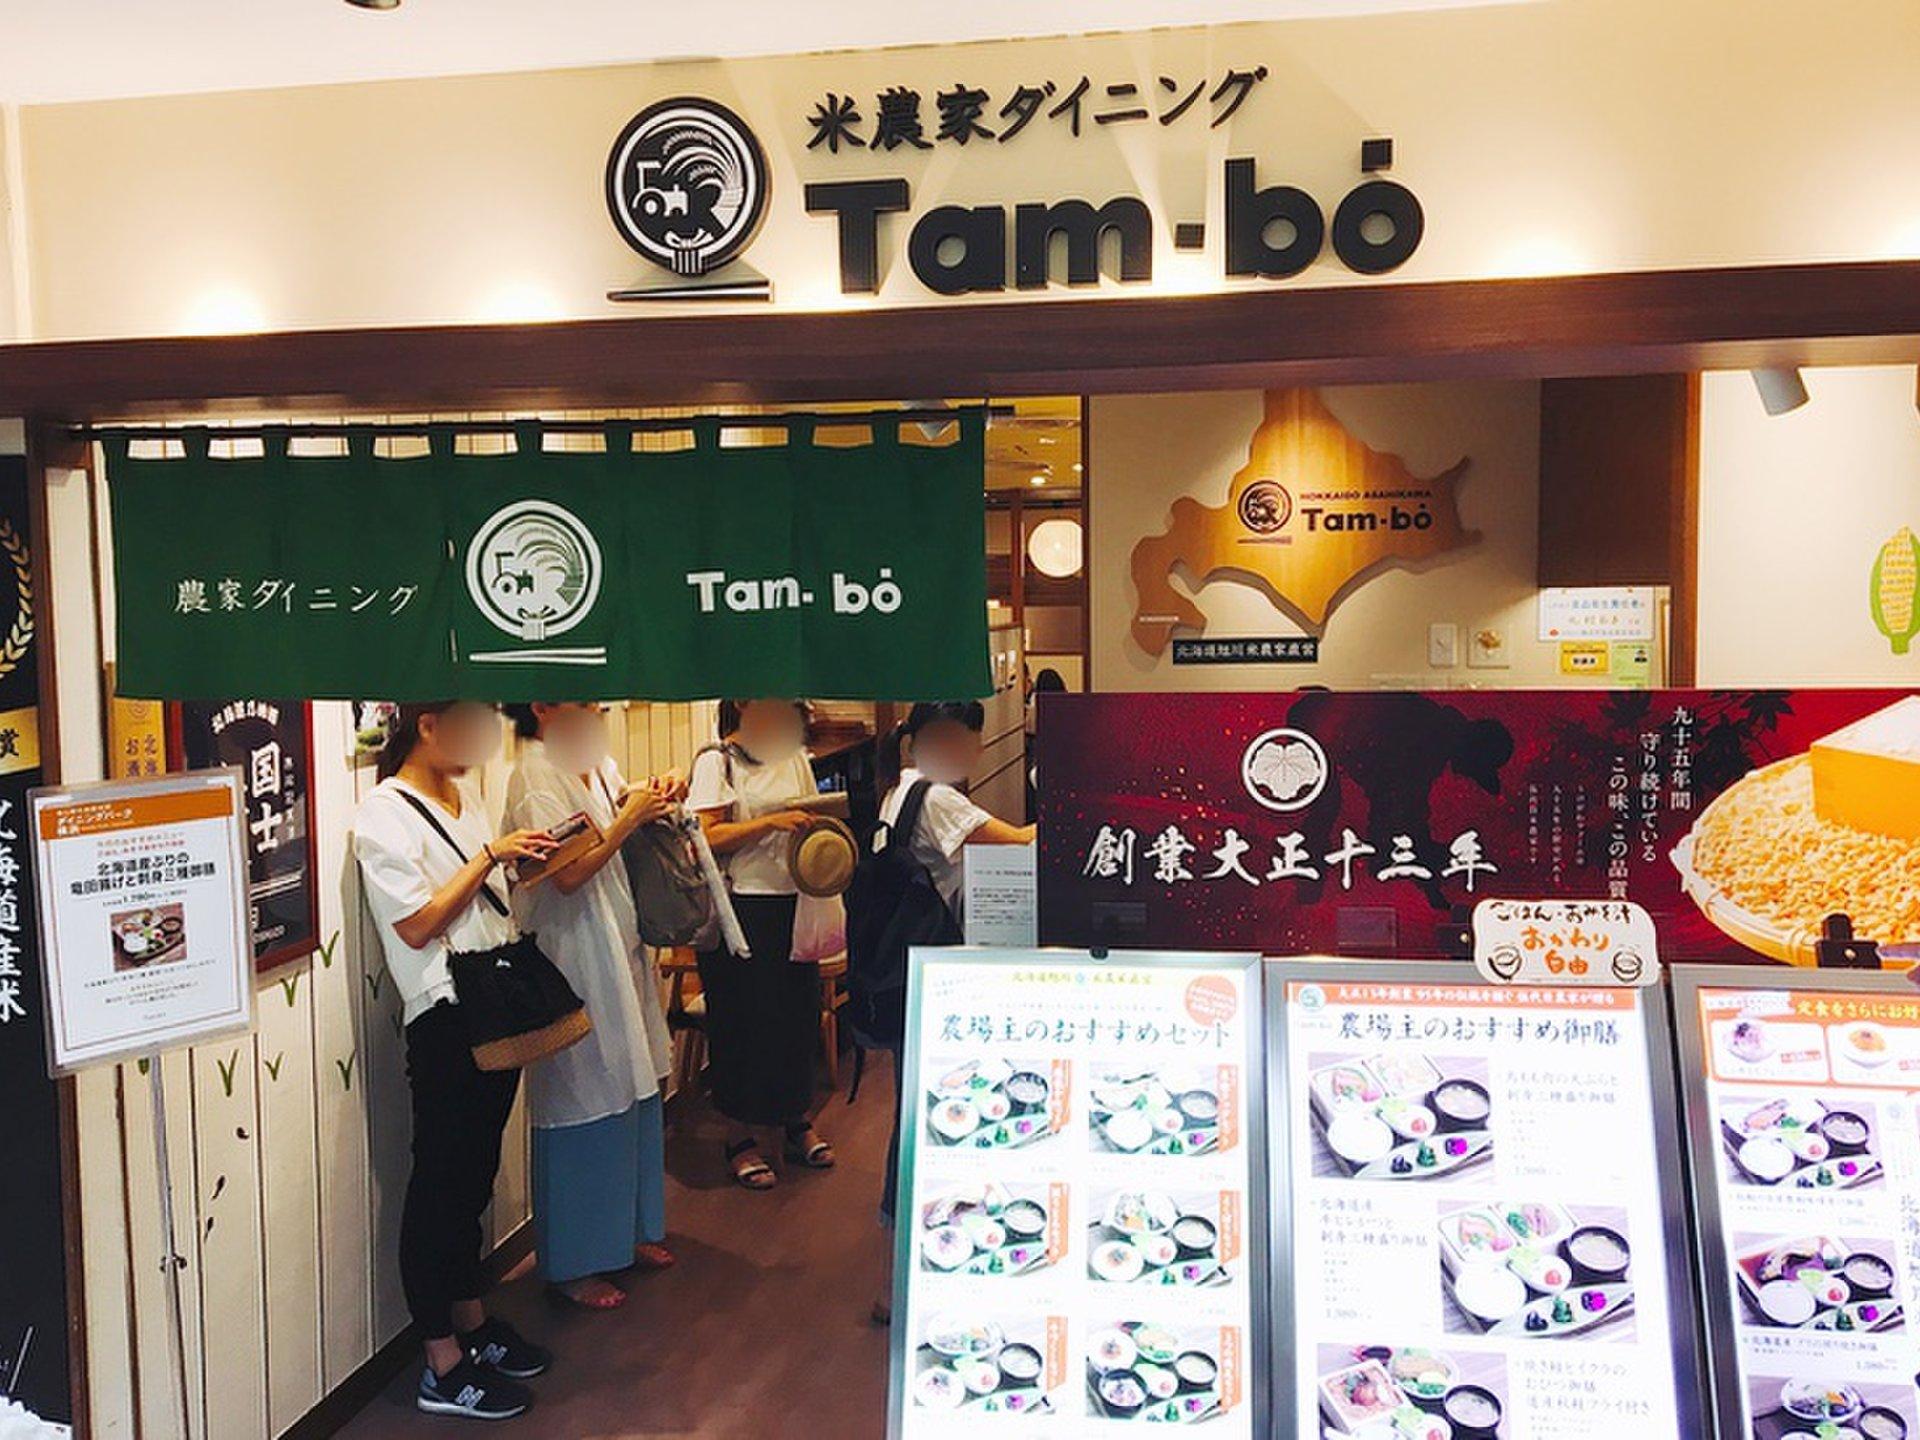 Tam-bo そごう横浜店